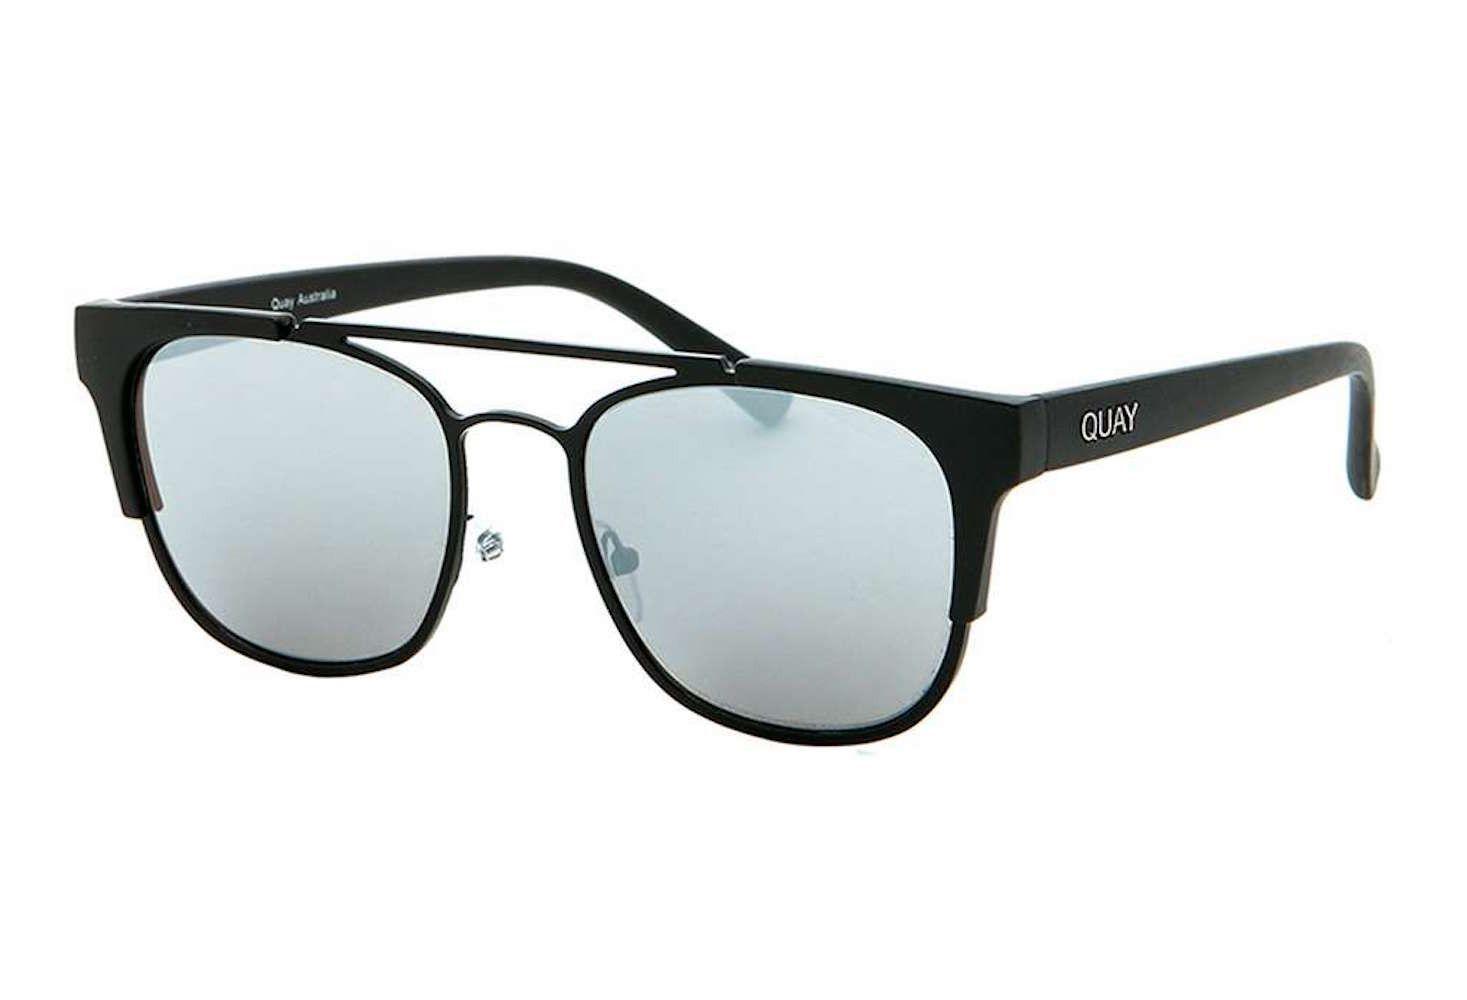 Quay High And Dry Sunglasses